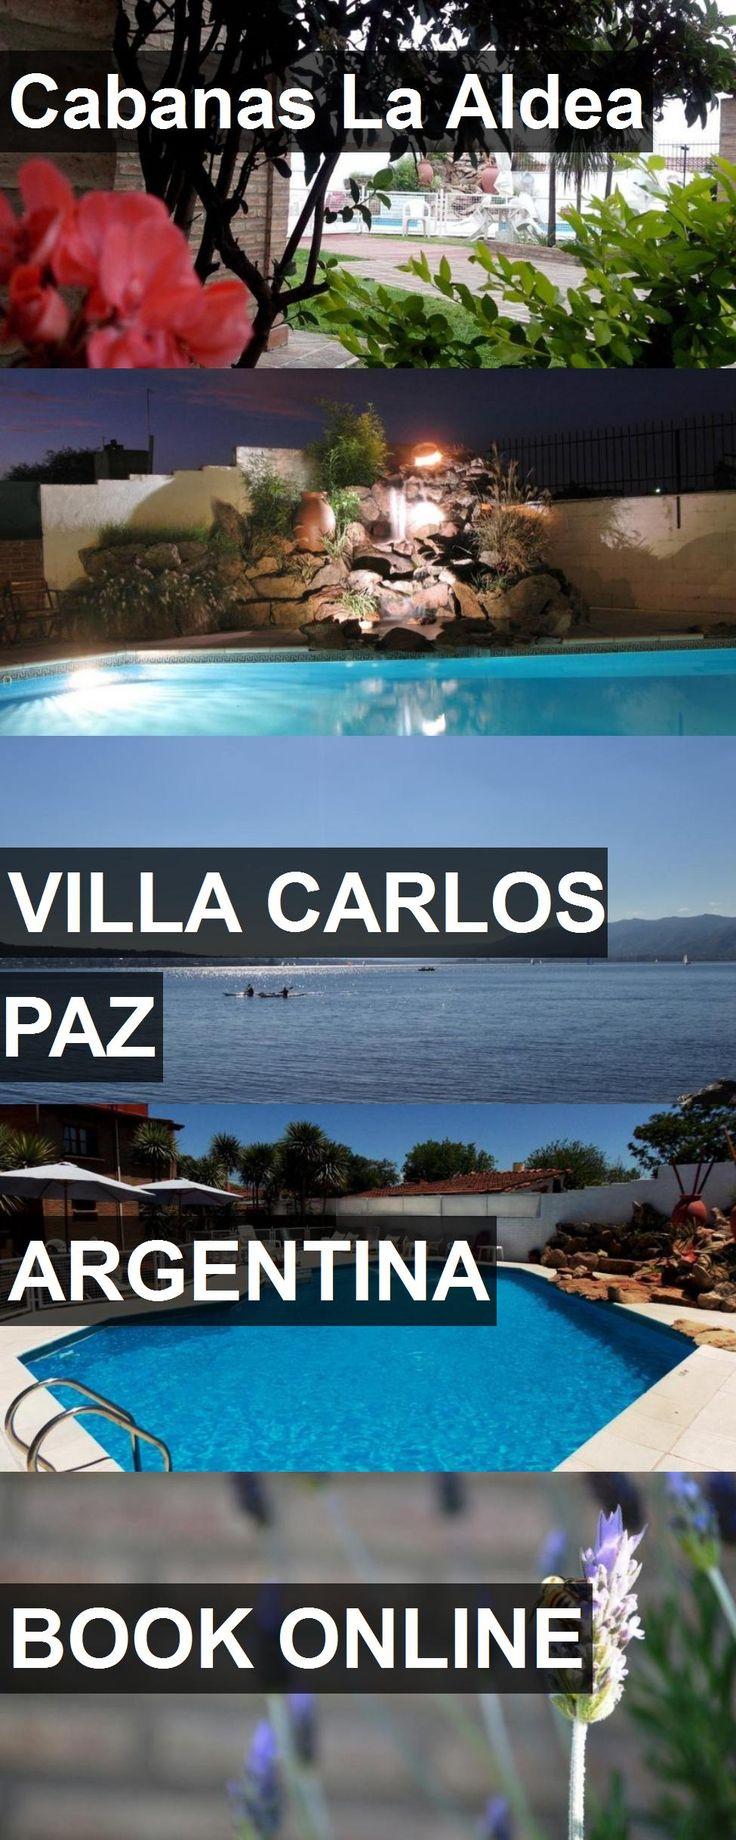 Hotel Cabanas La Aldea in Villa Carlos Paz, Argentina. For more information, photos, reviews and best prices please follow the link. #Argentina #VillaCarlosPaz #travel #vacation #hotel